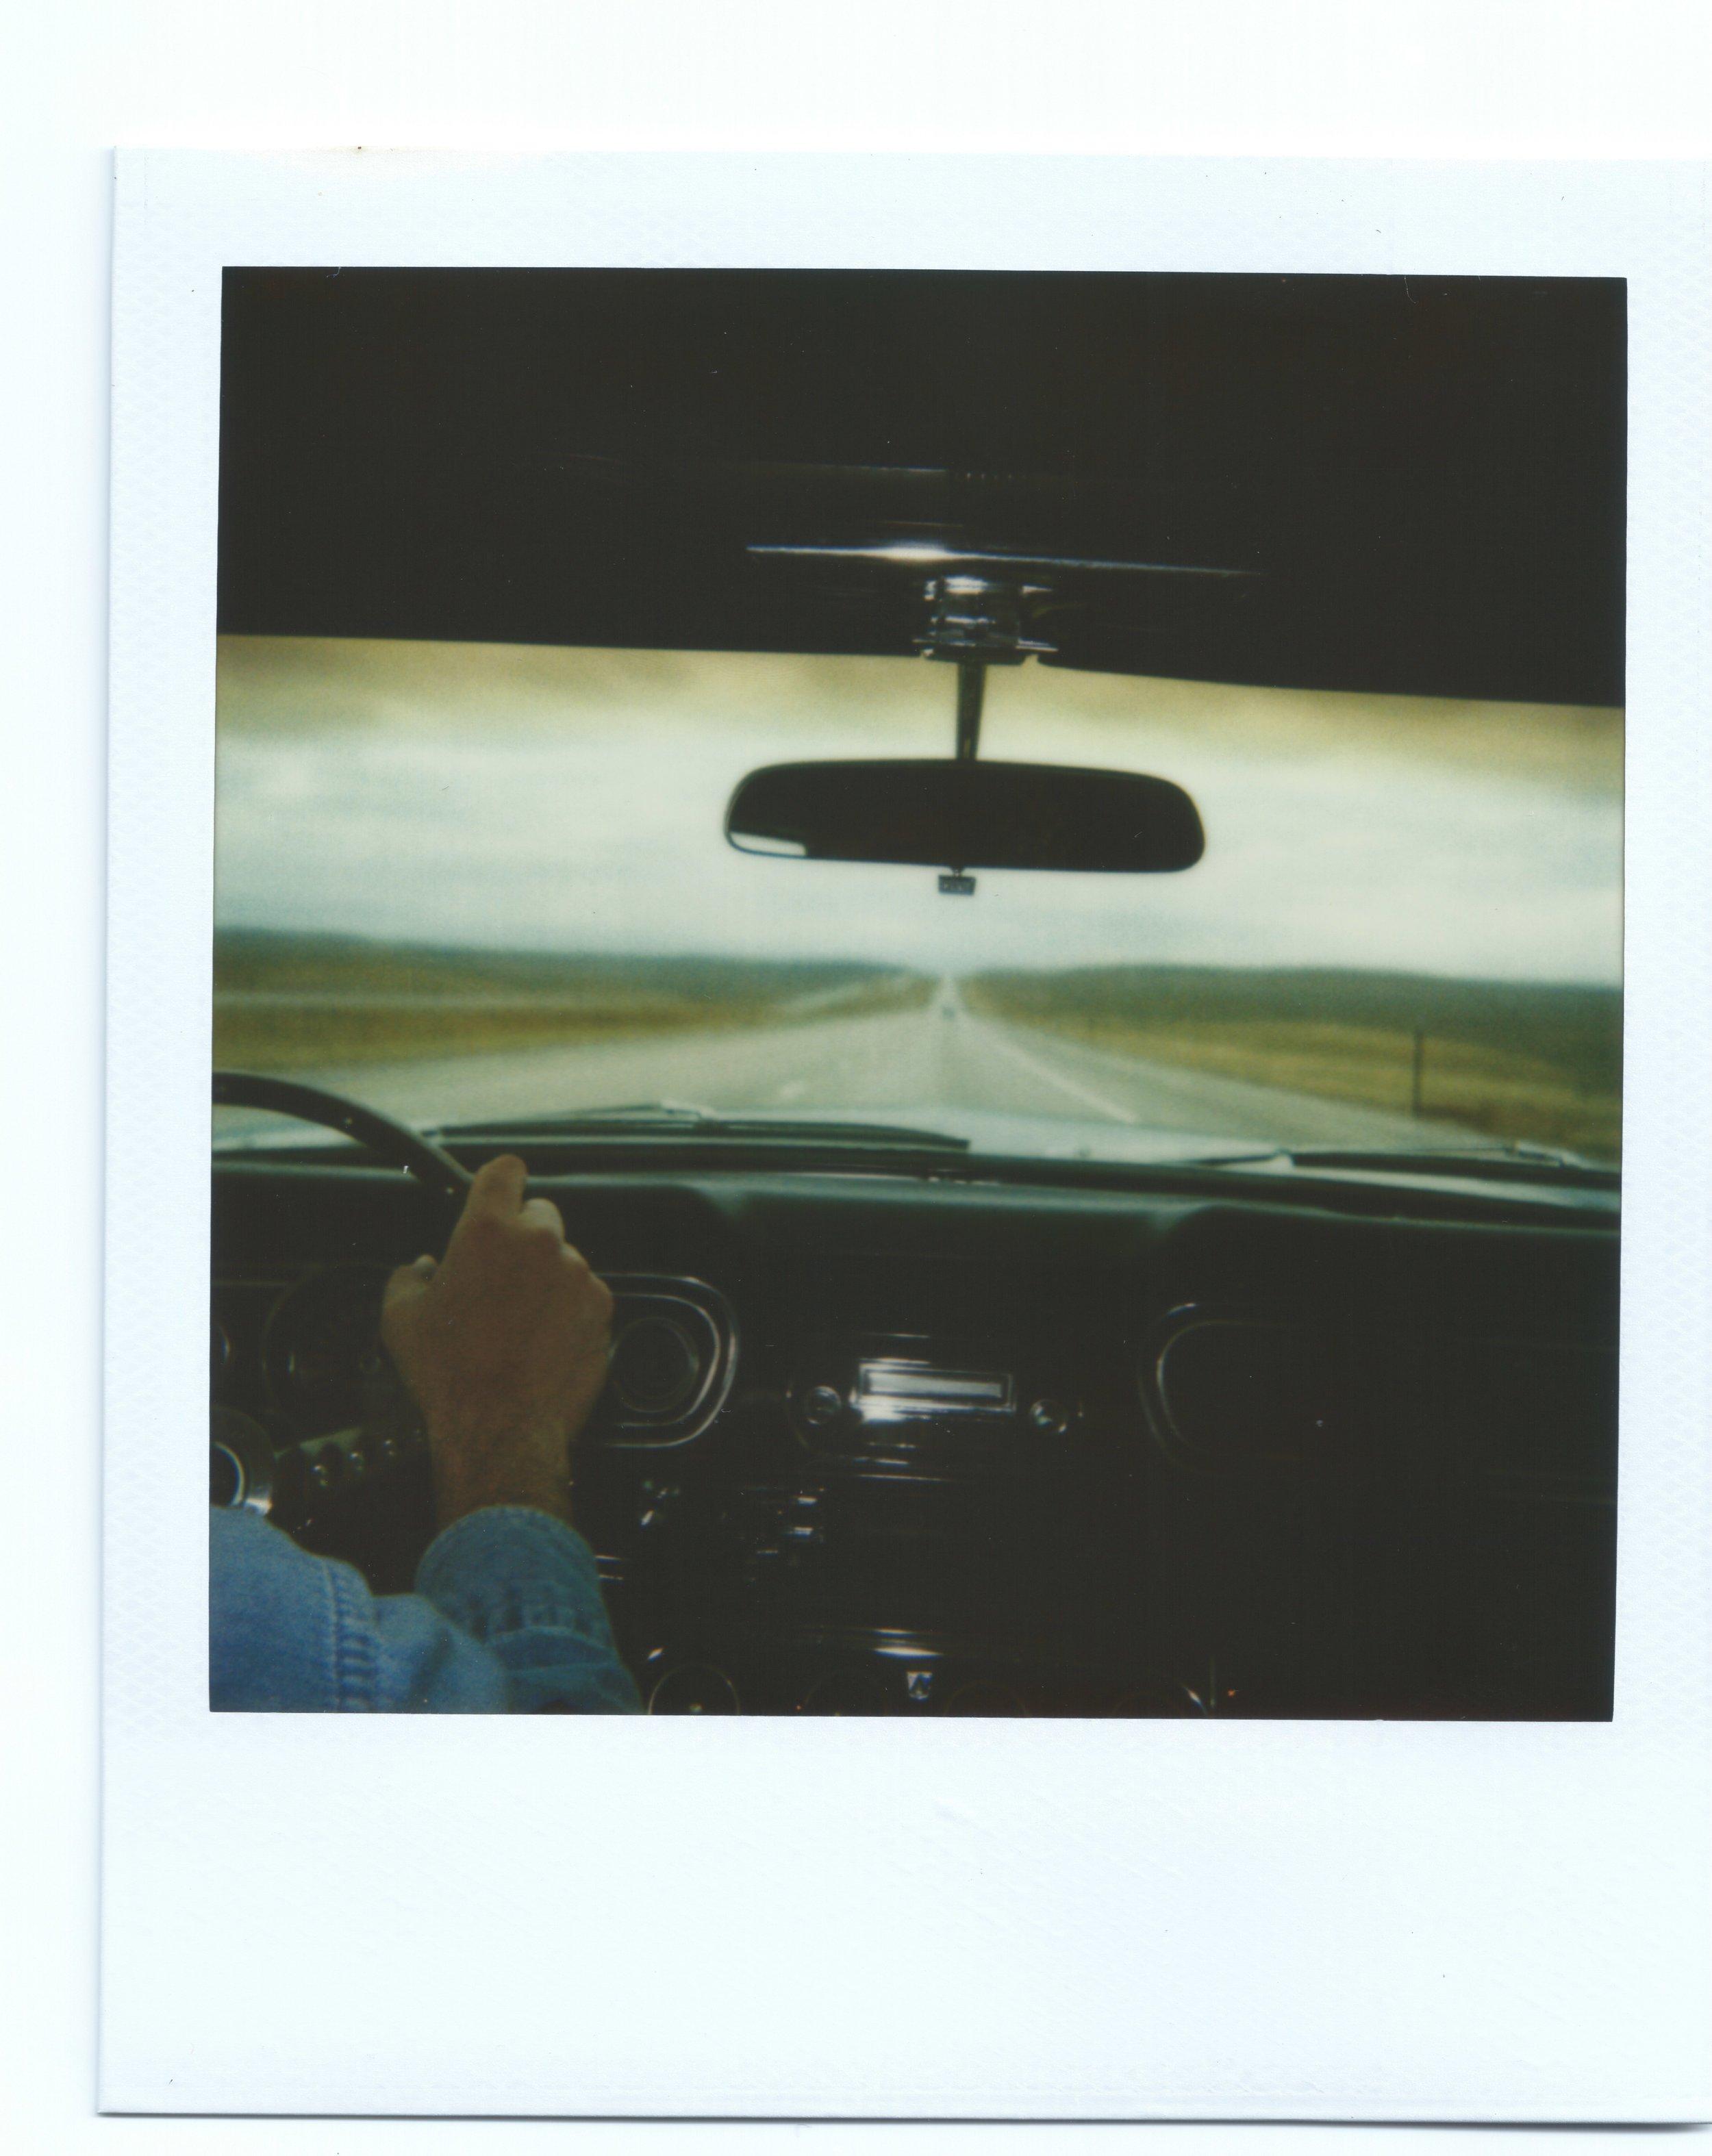 CarInterior_roadviewdashboard_binder6.jpeg